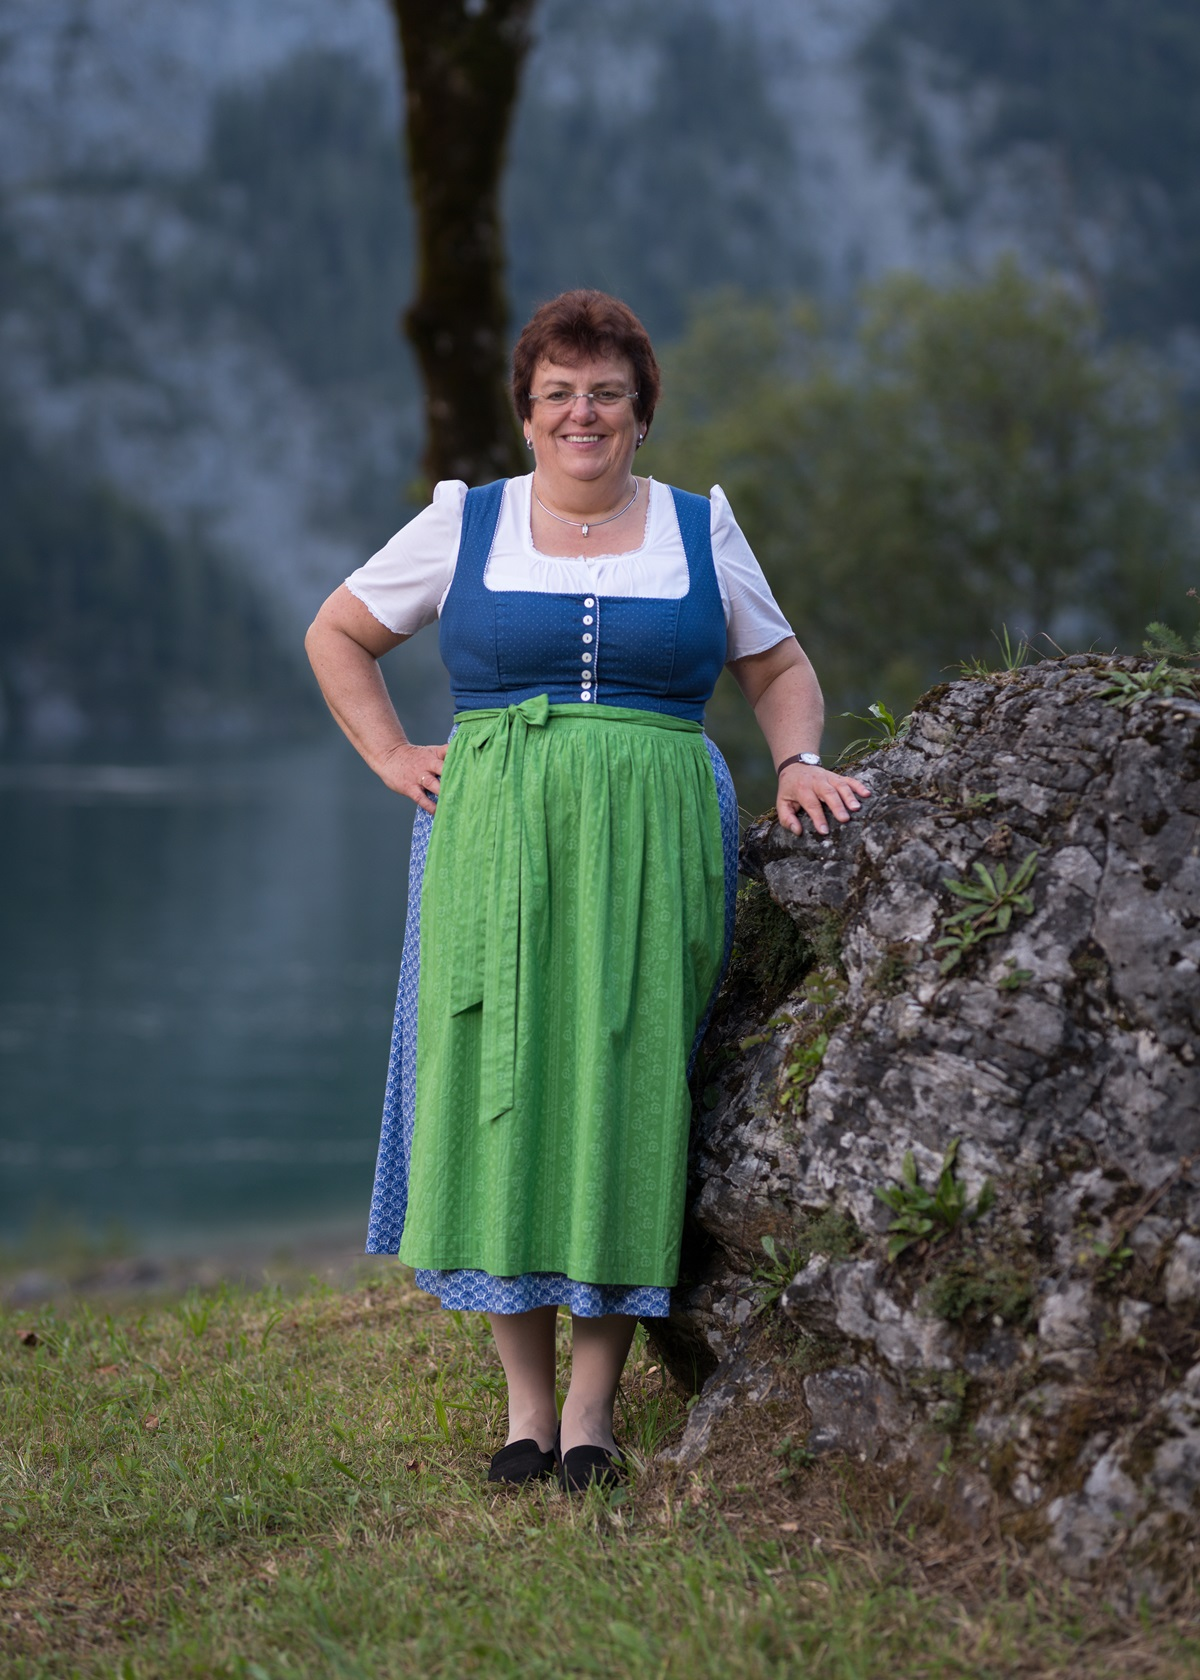 Monika Rasp